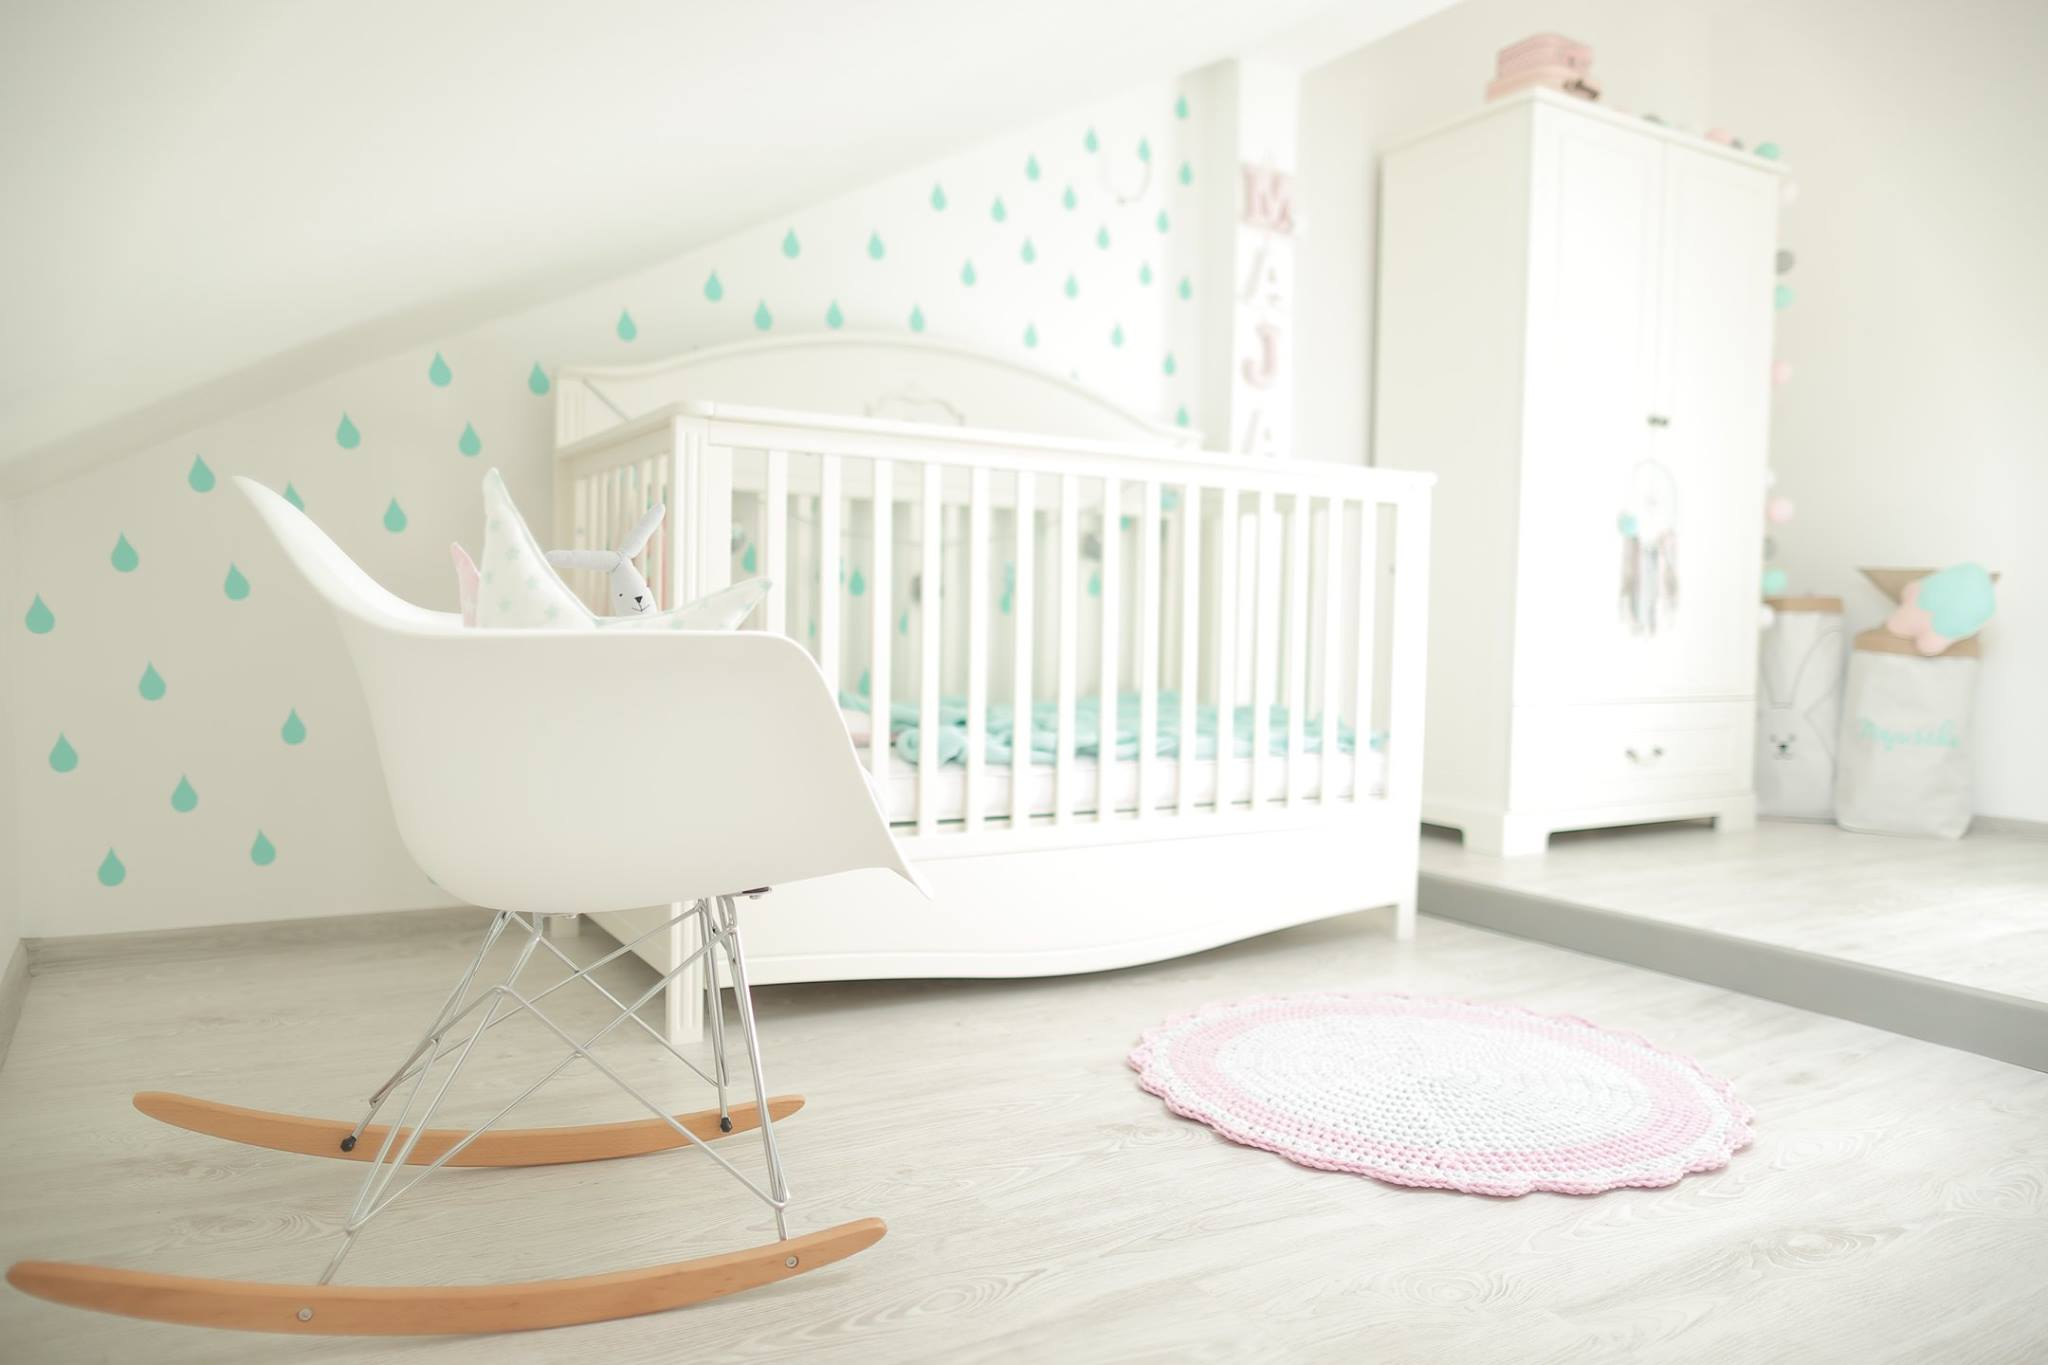 babyzimmer gute nacht zimmeria kinderzimmer. Black Bedroom Furniture Sets. Home Design Ideas